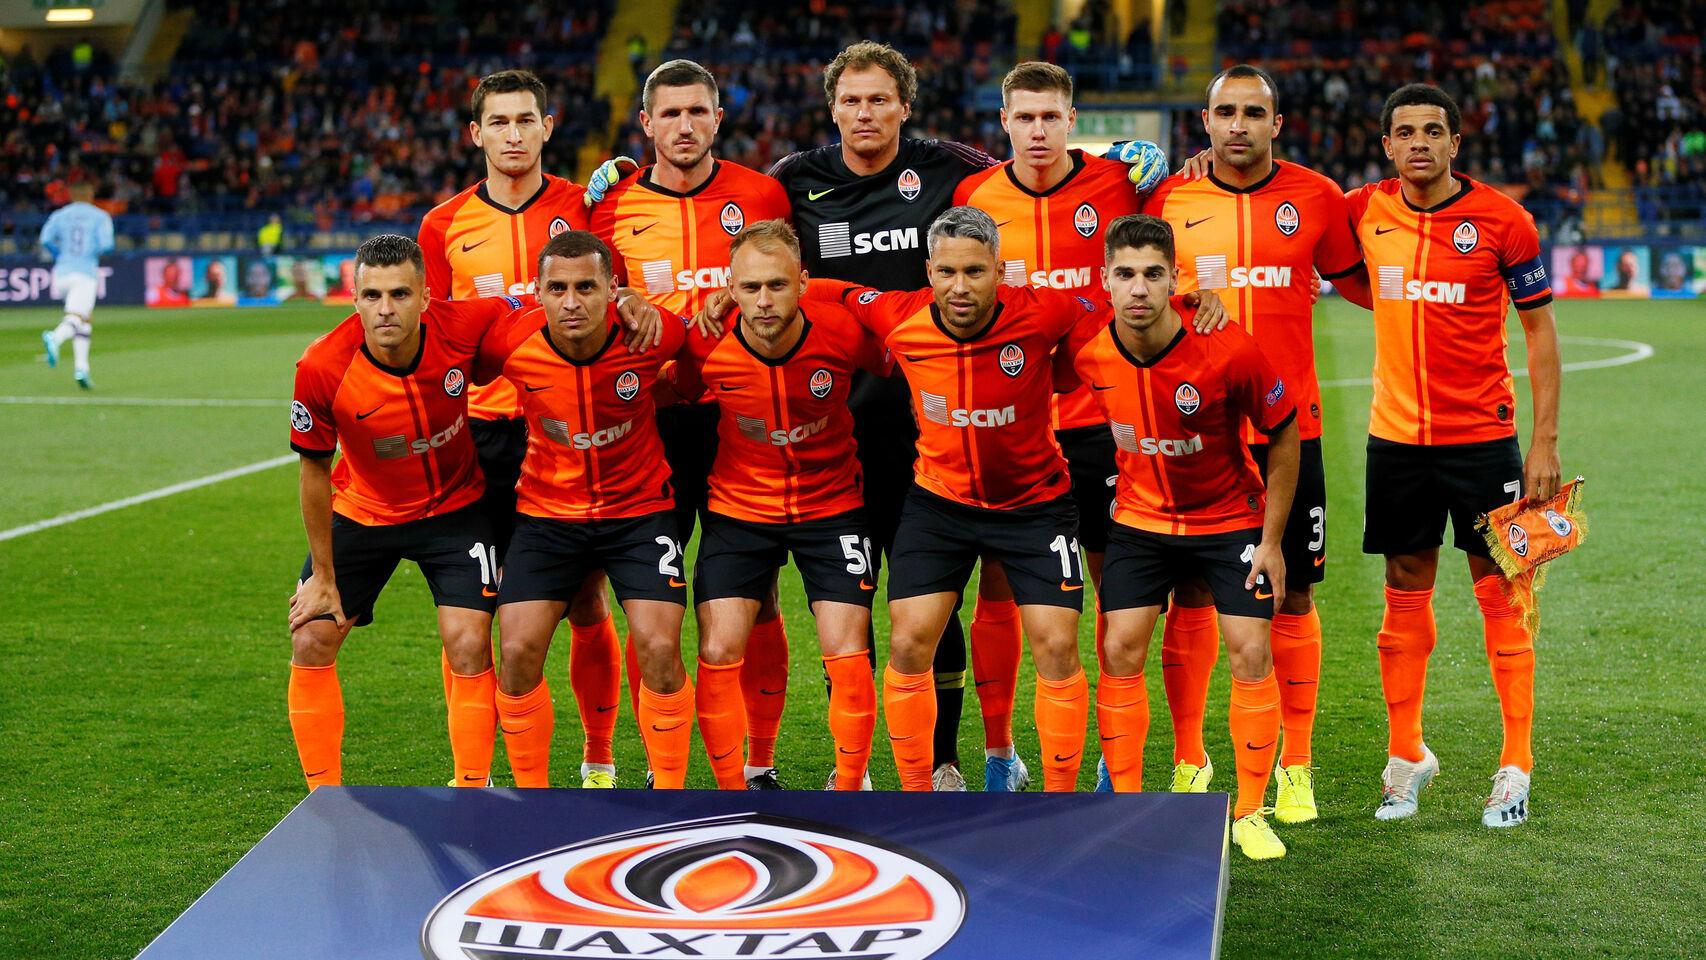 fc_shakhtar_donetsk-futbol.jpg (433.67 Kb)